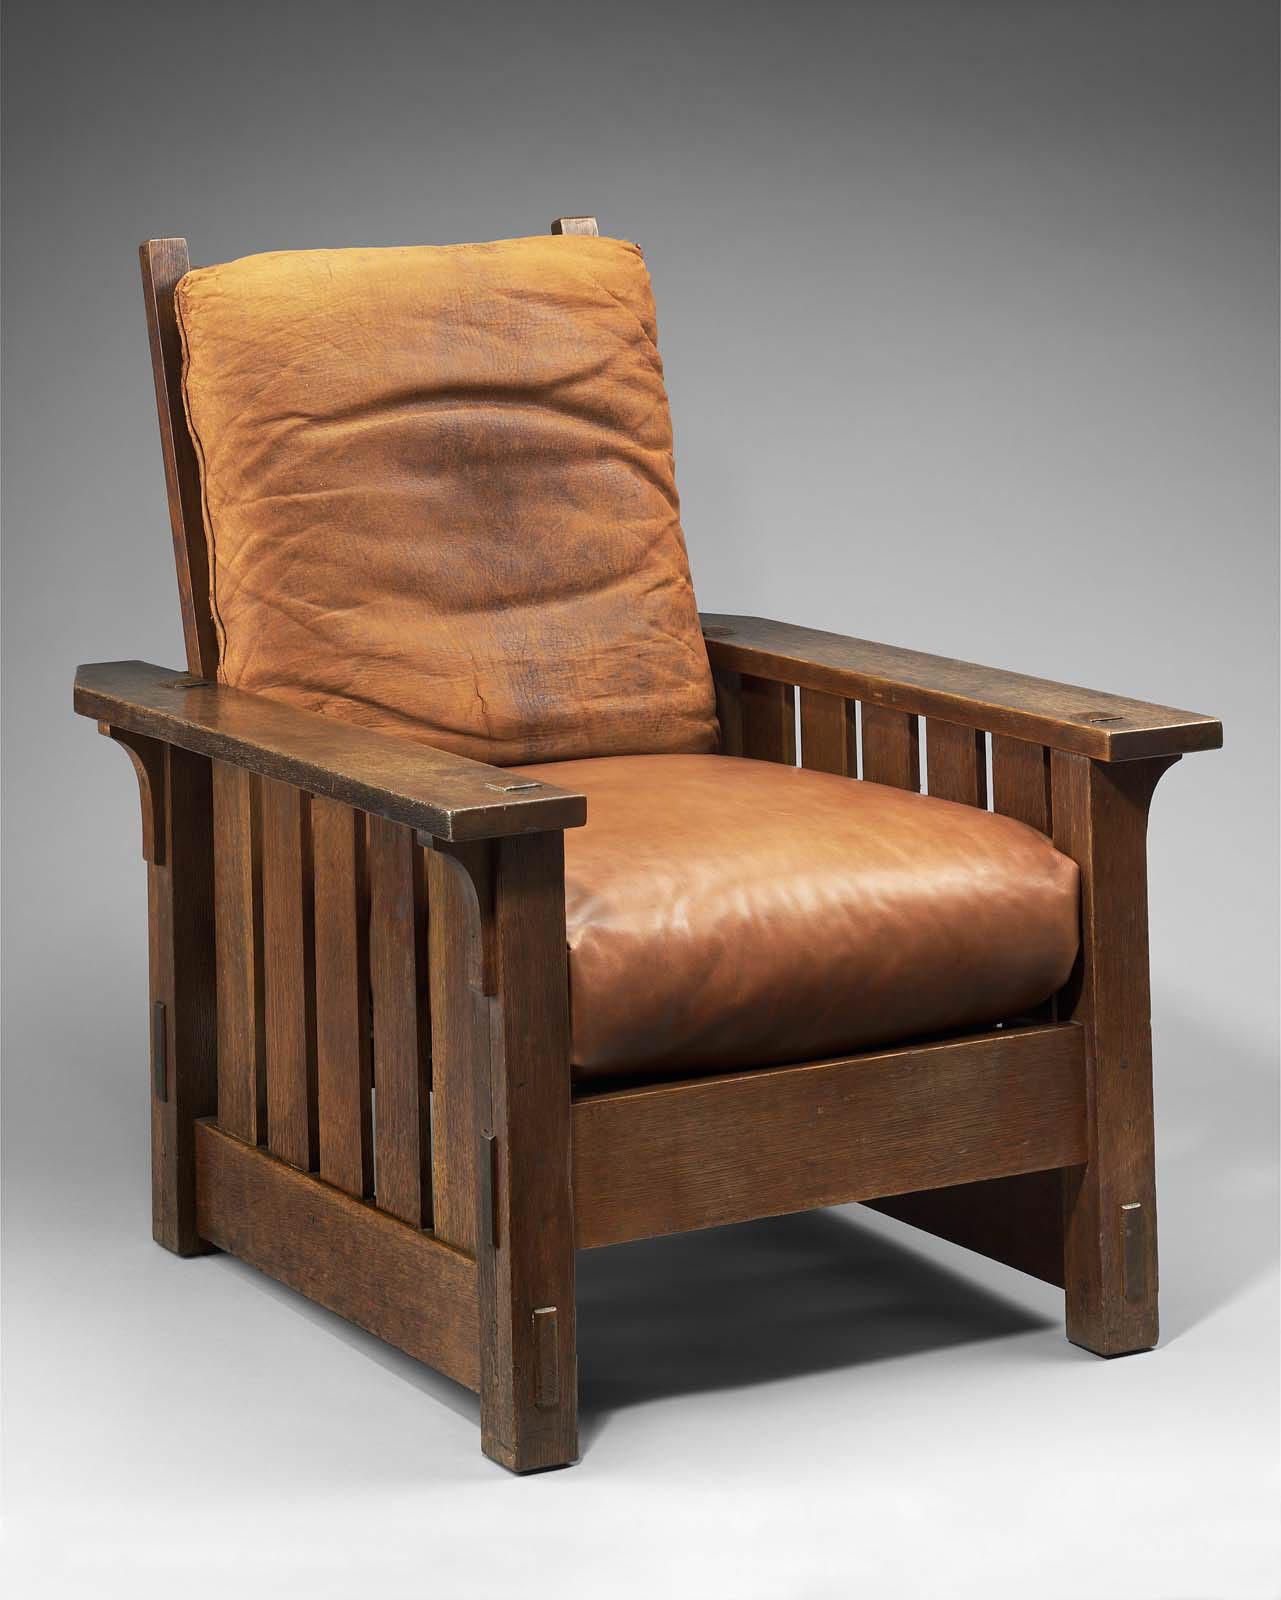 Adjustable Back Chair, No. 2342